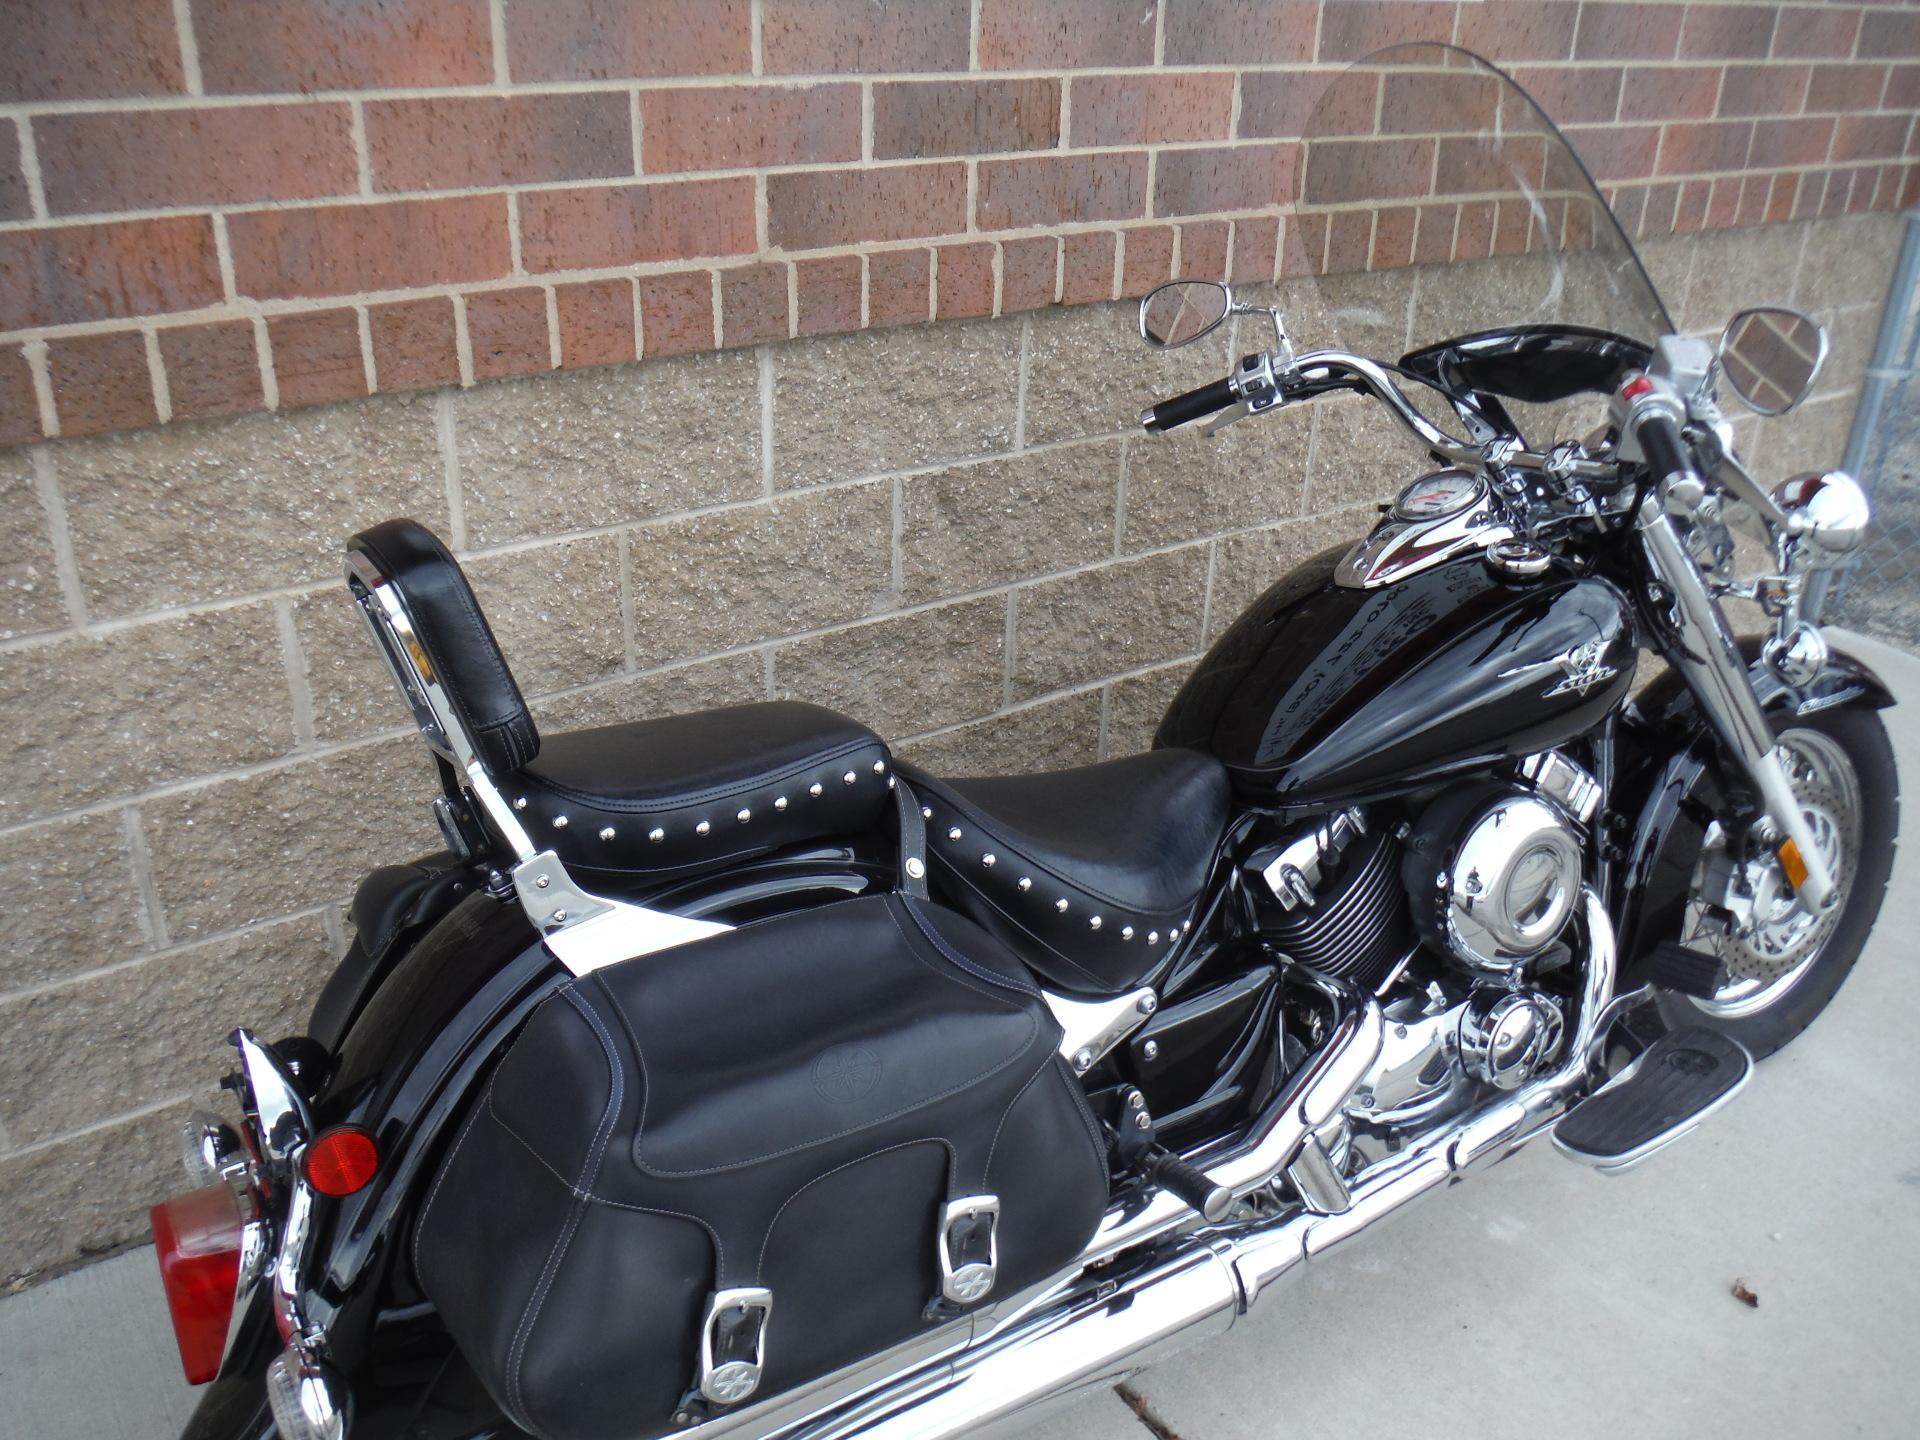 2009 Yamaha V Star 650 Silverado